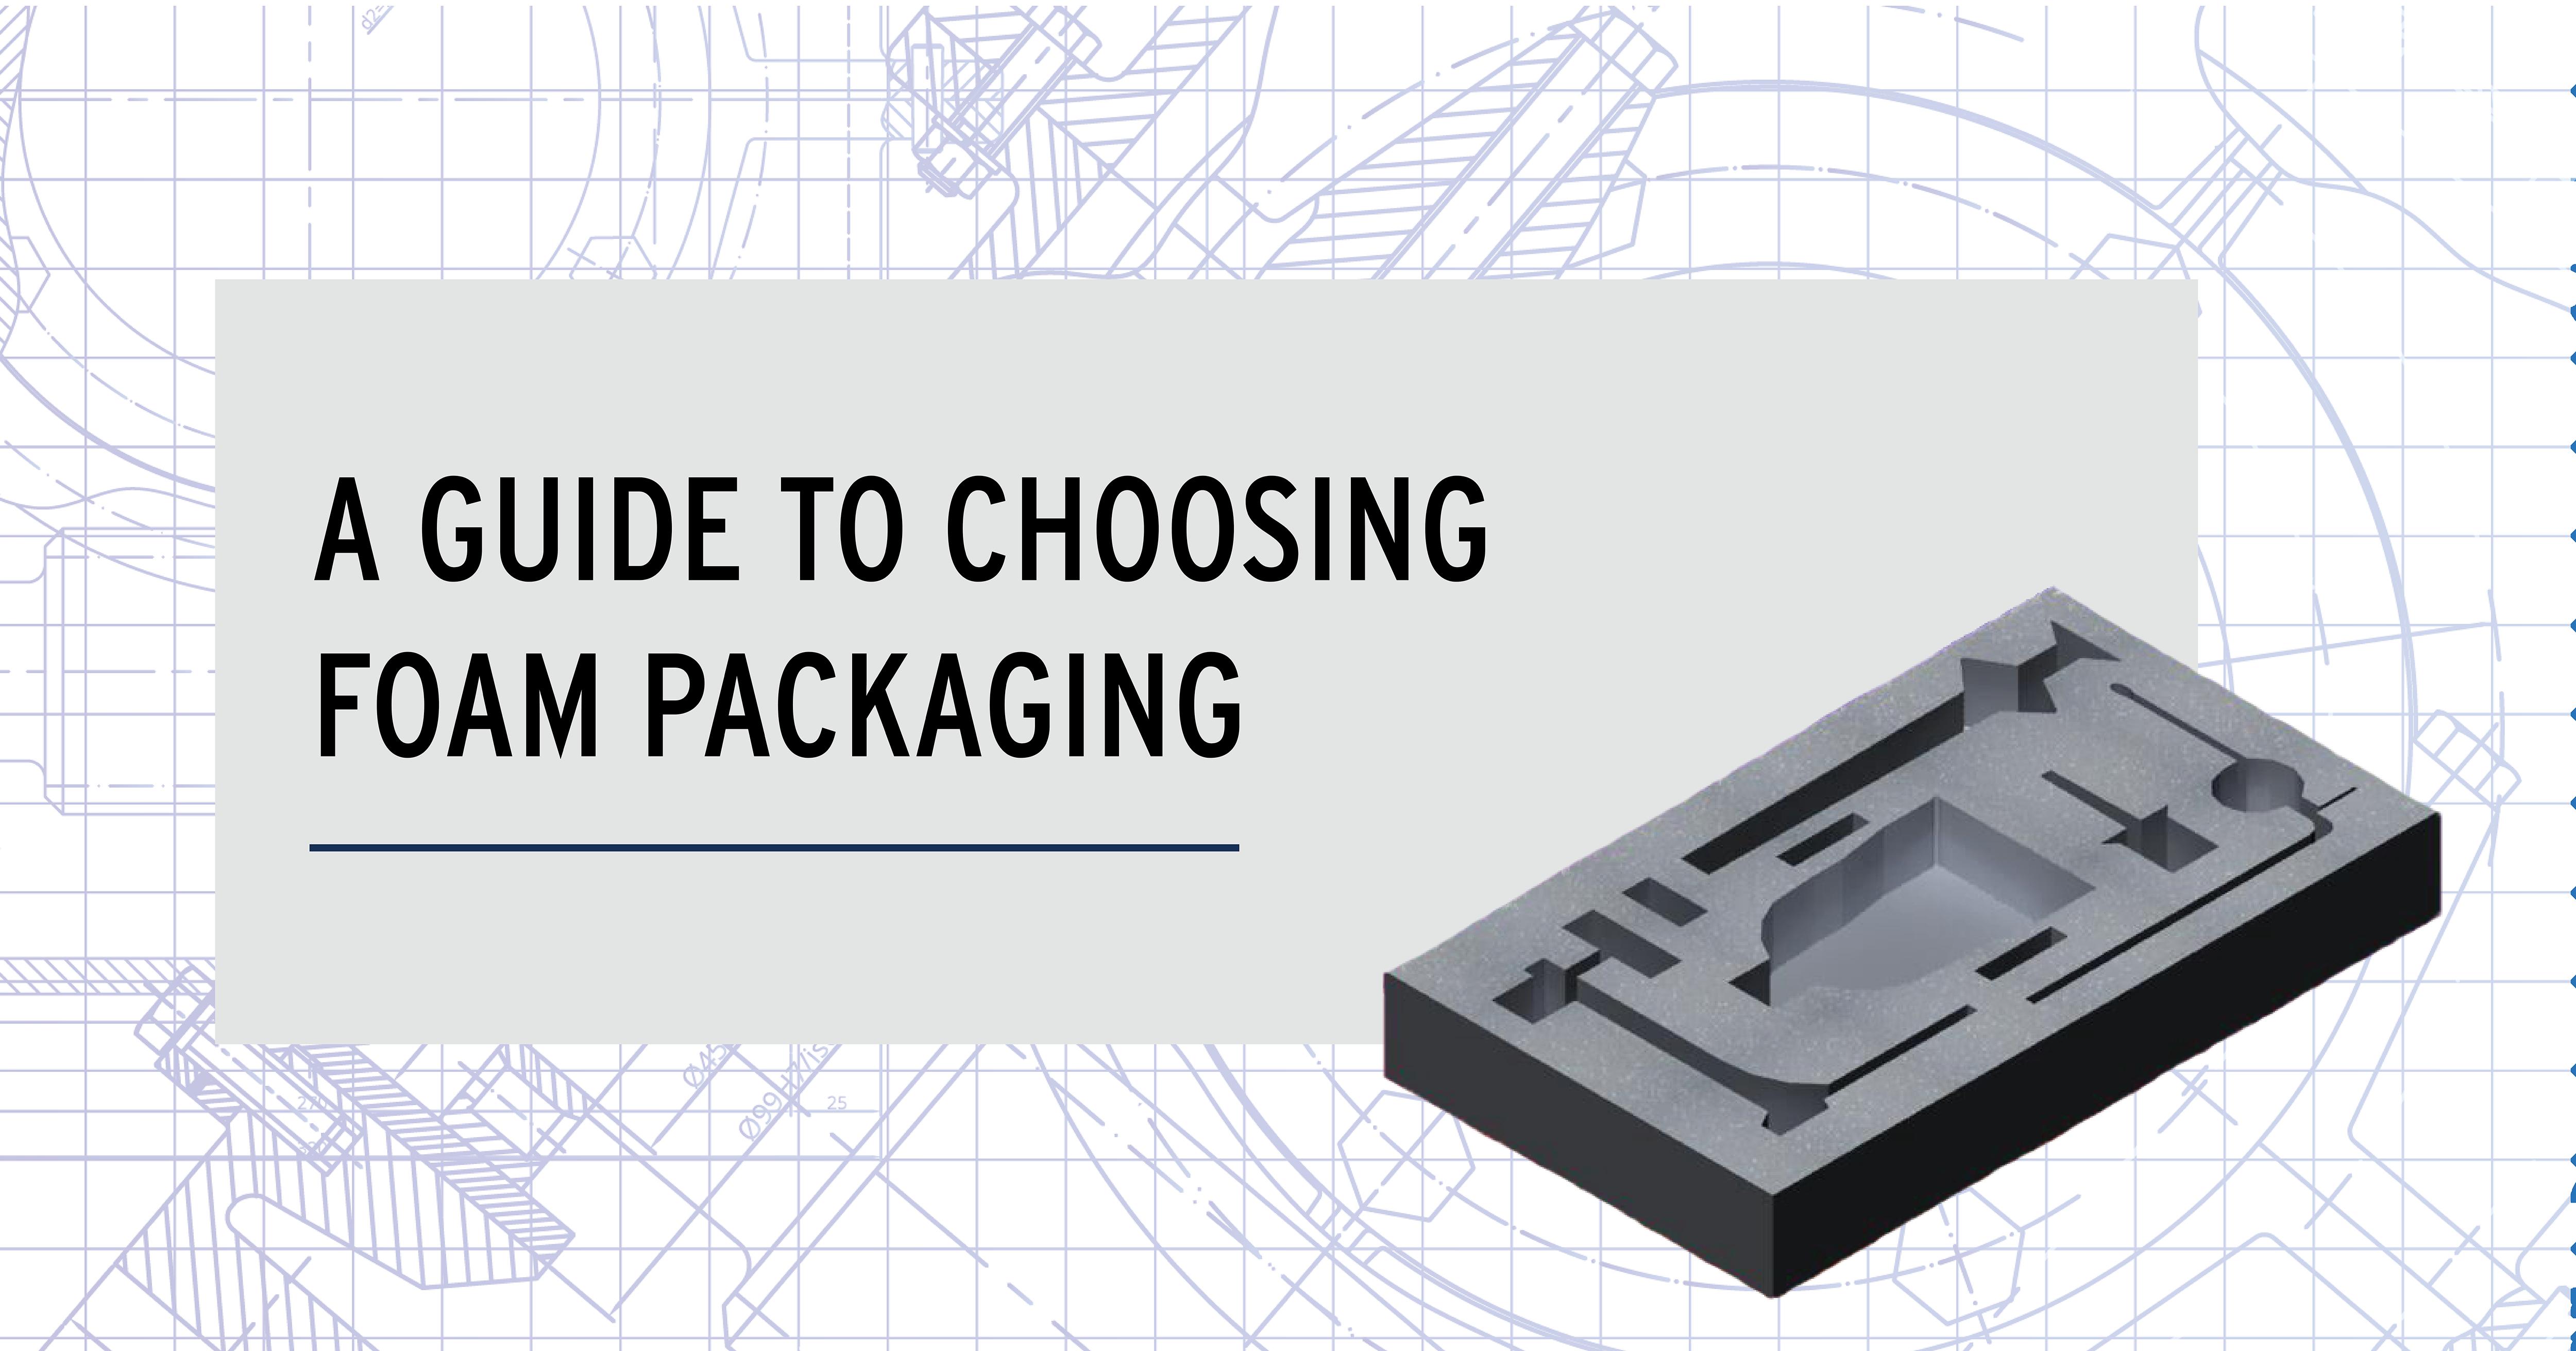 A Guide to Choosing Foam Packaging